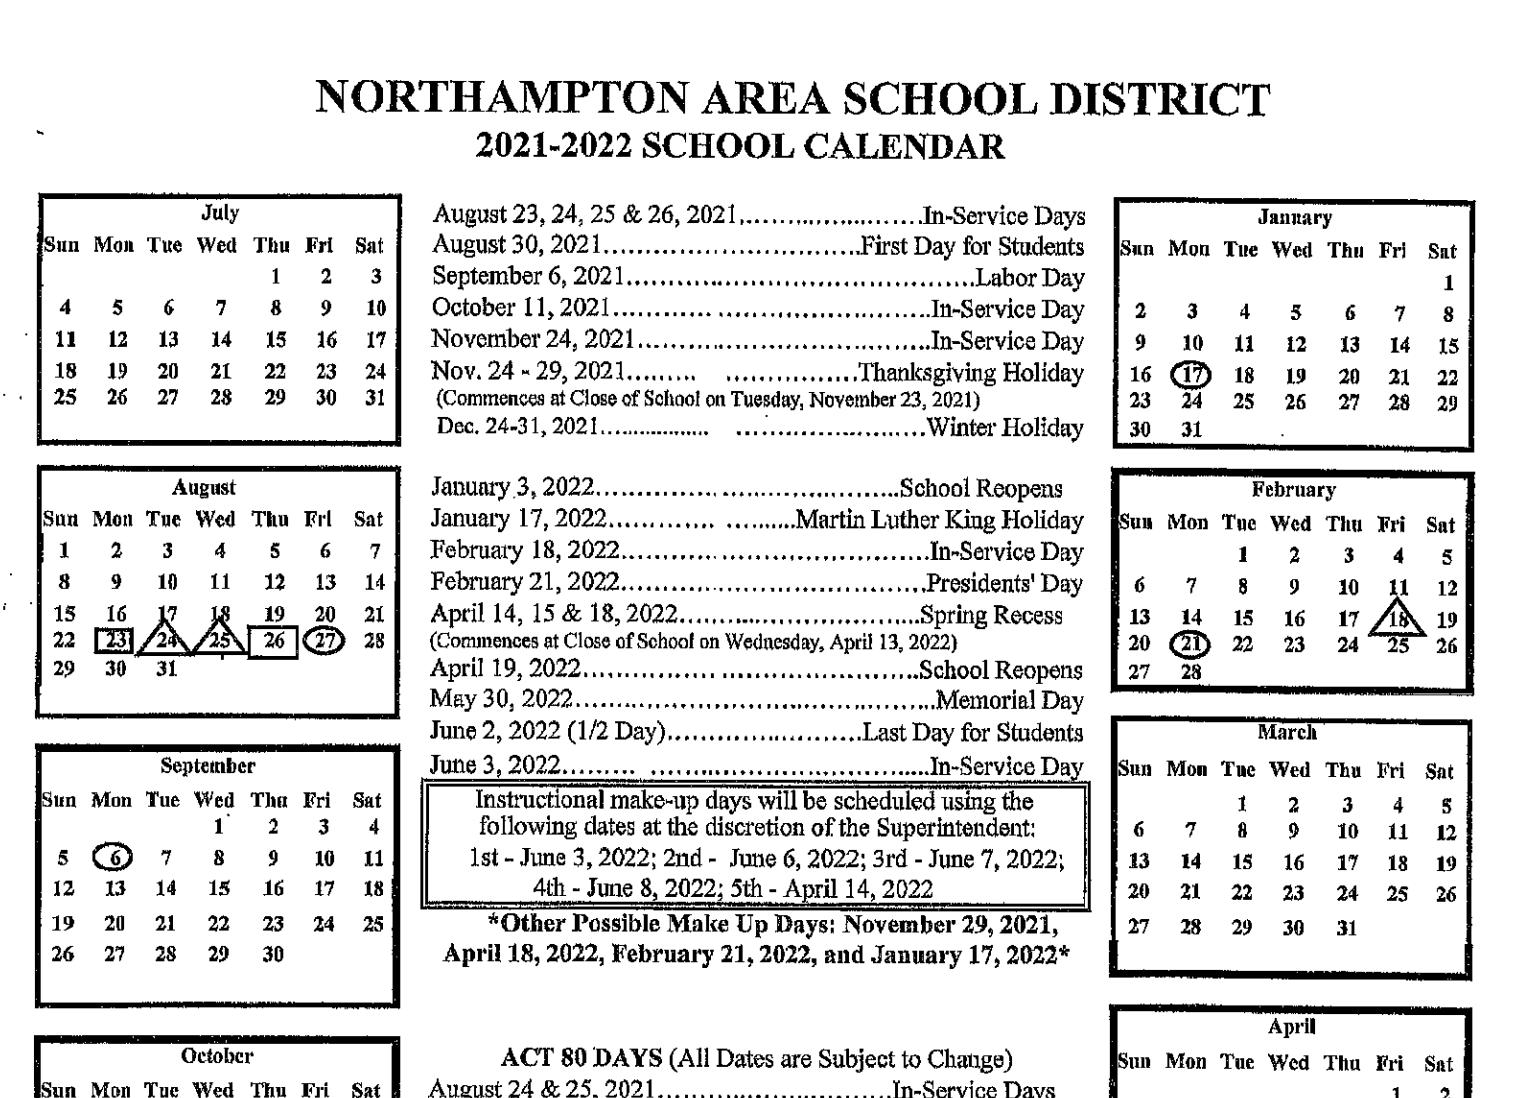 District Calendar thumbnail image